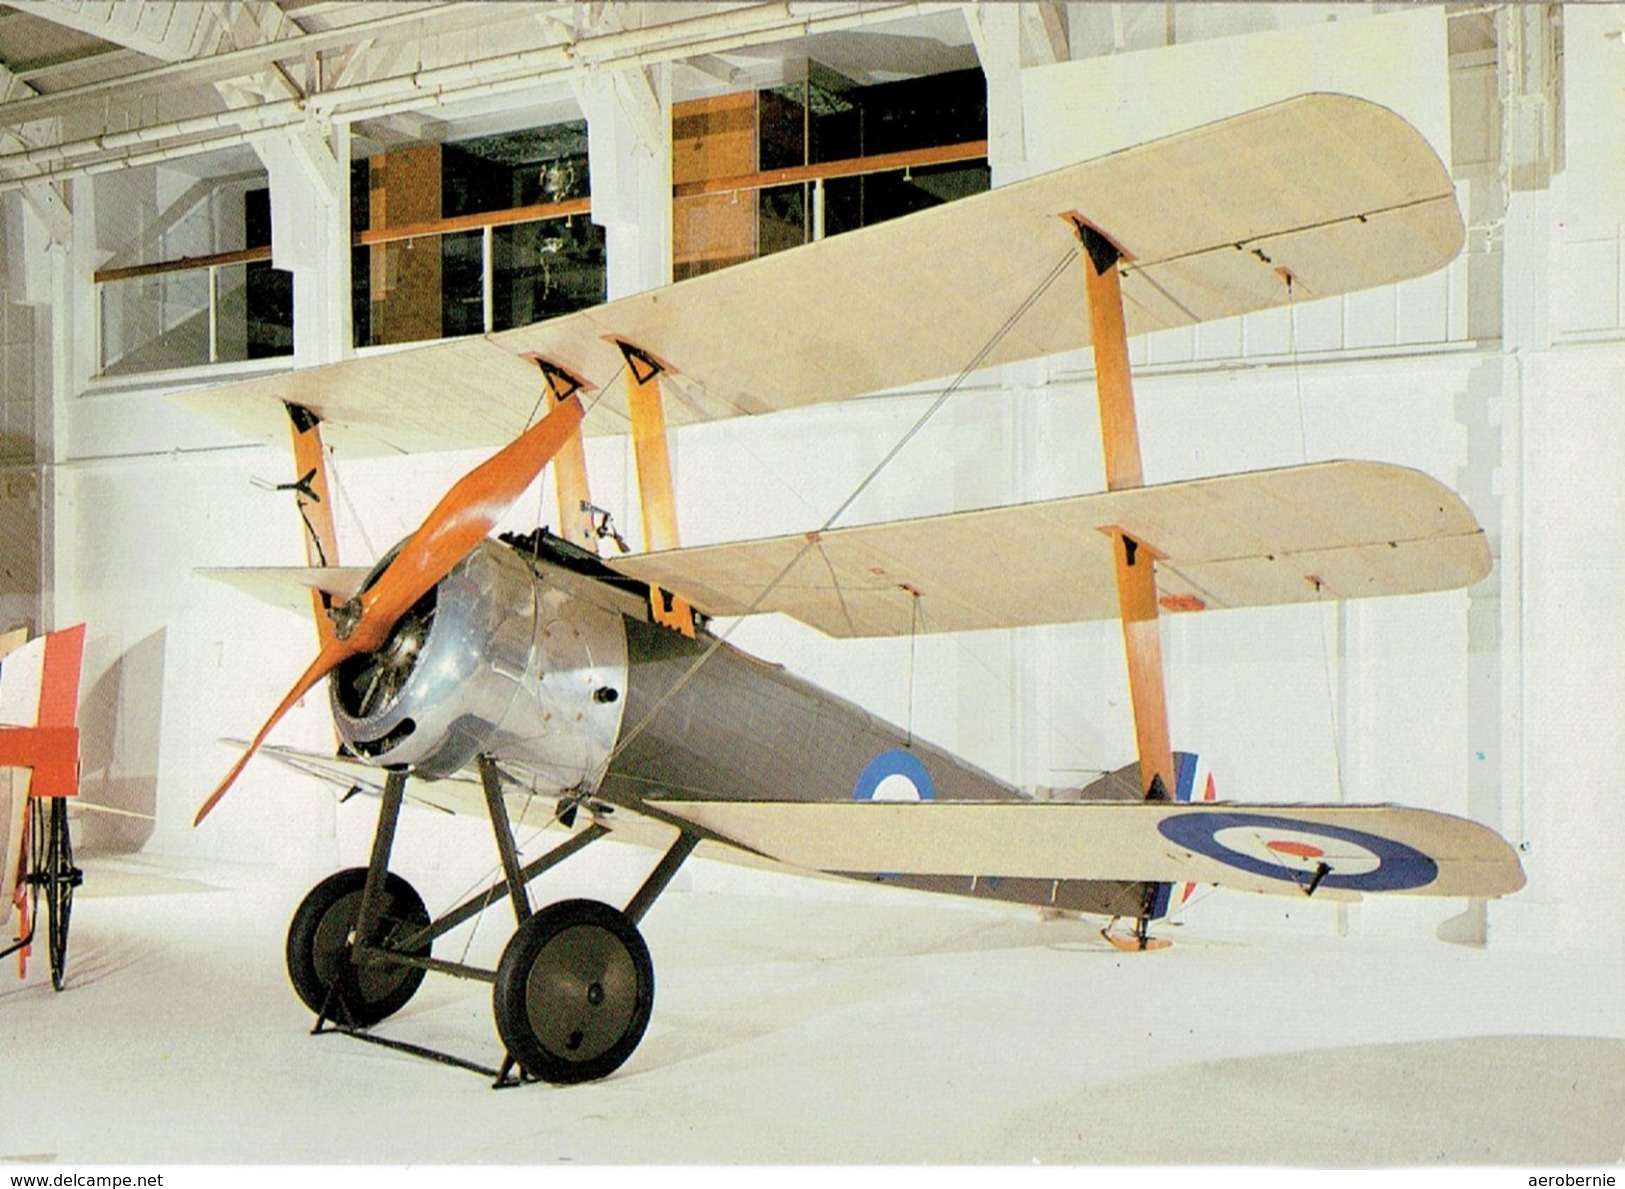 SOPWITH Triplane - Royal Air Force (1916) (im Museum - Modern Card) - 1914-1918: 1. Weltkrieg